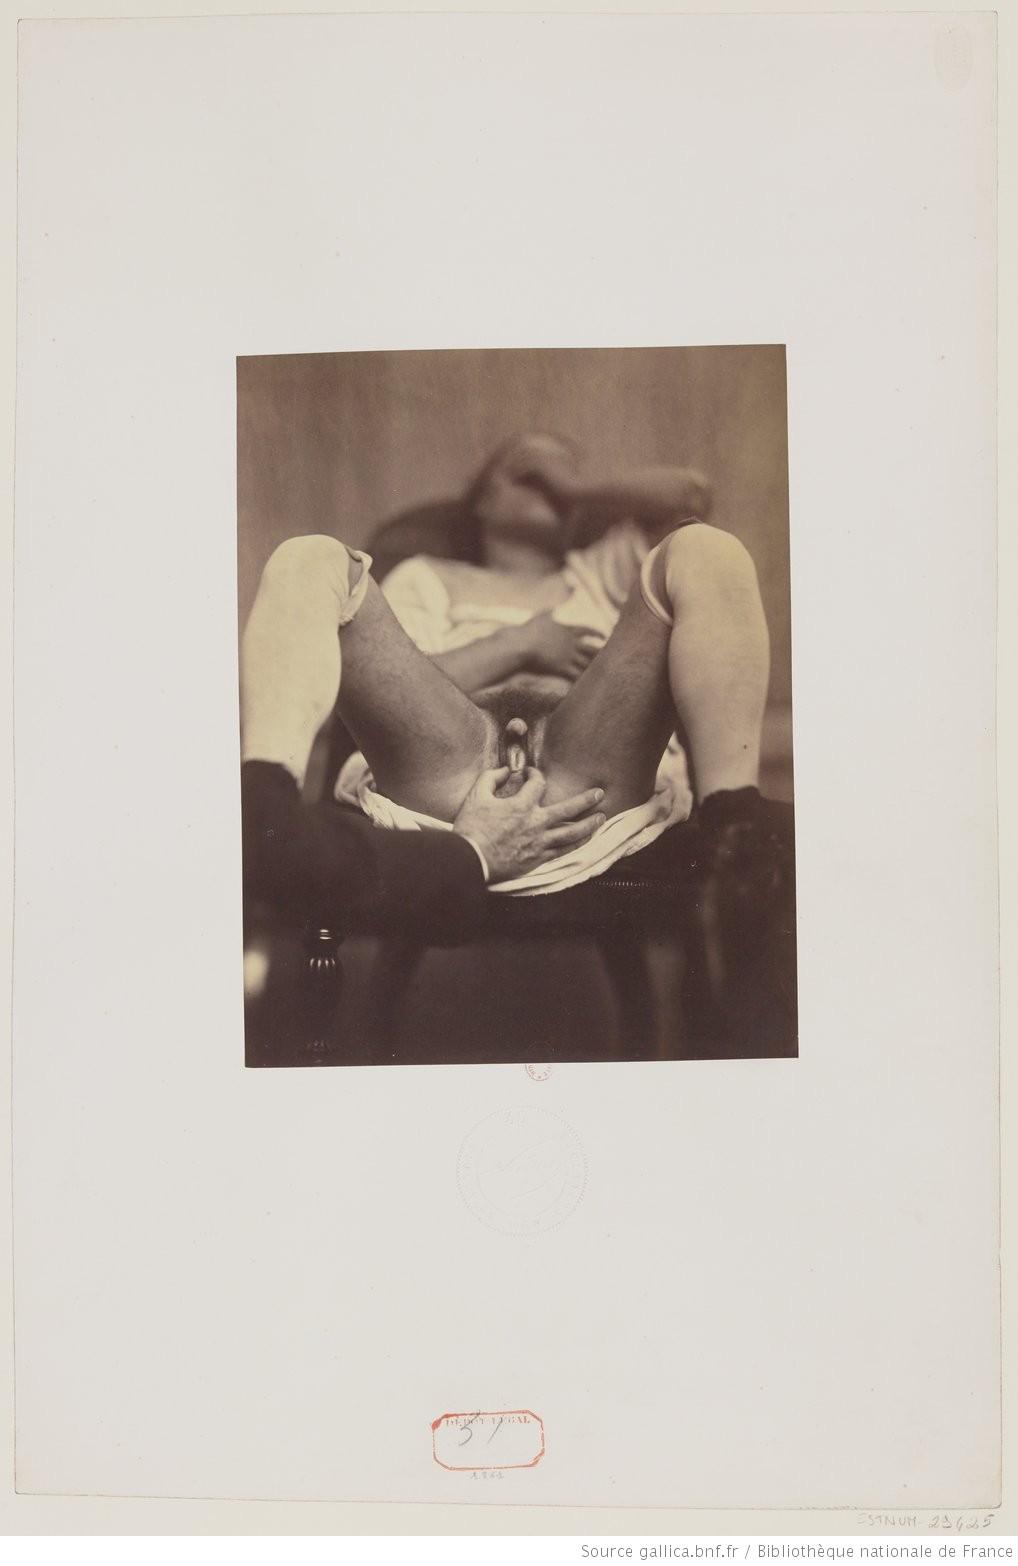 Hermaphrodite [Hermaphrodite] : [lot de photographies] / Nadar